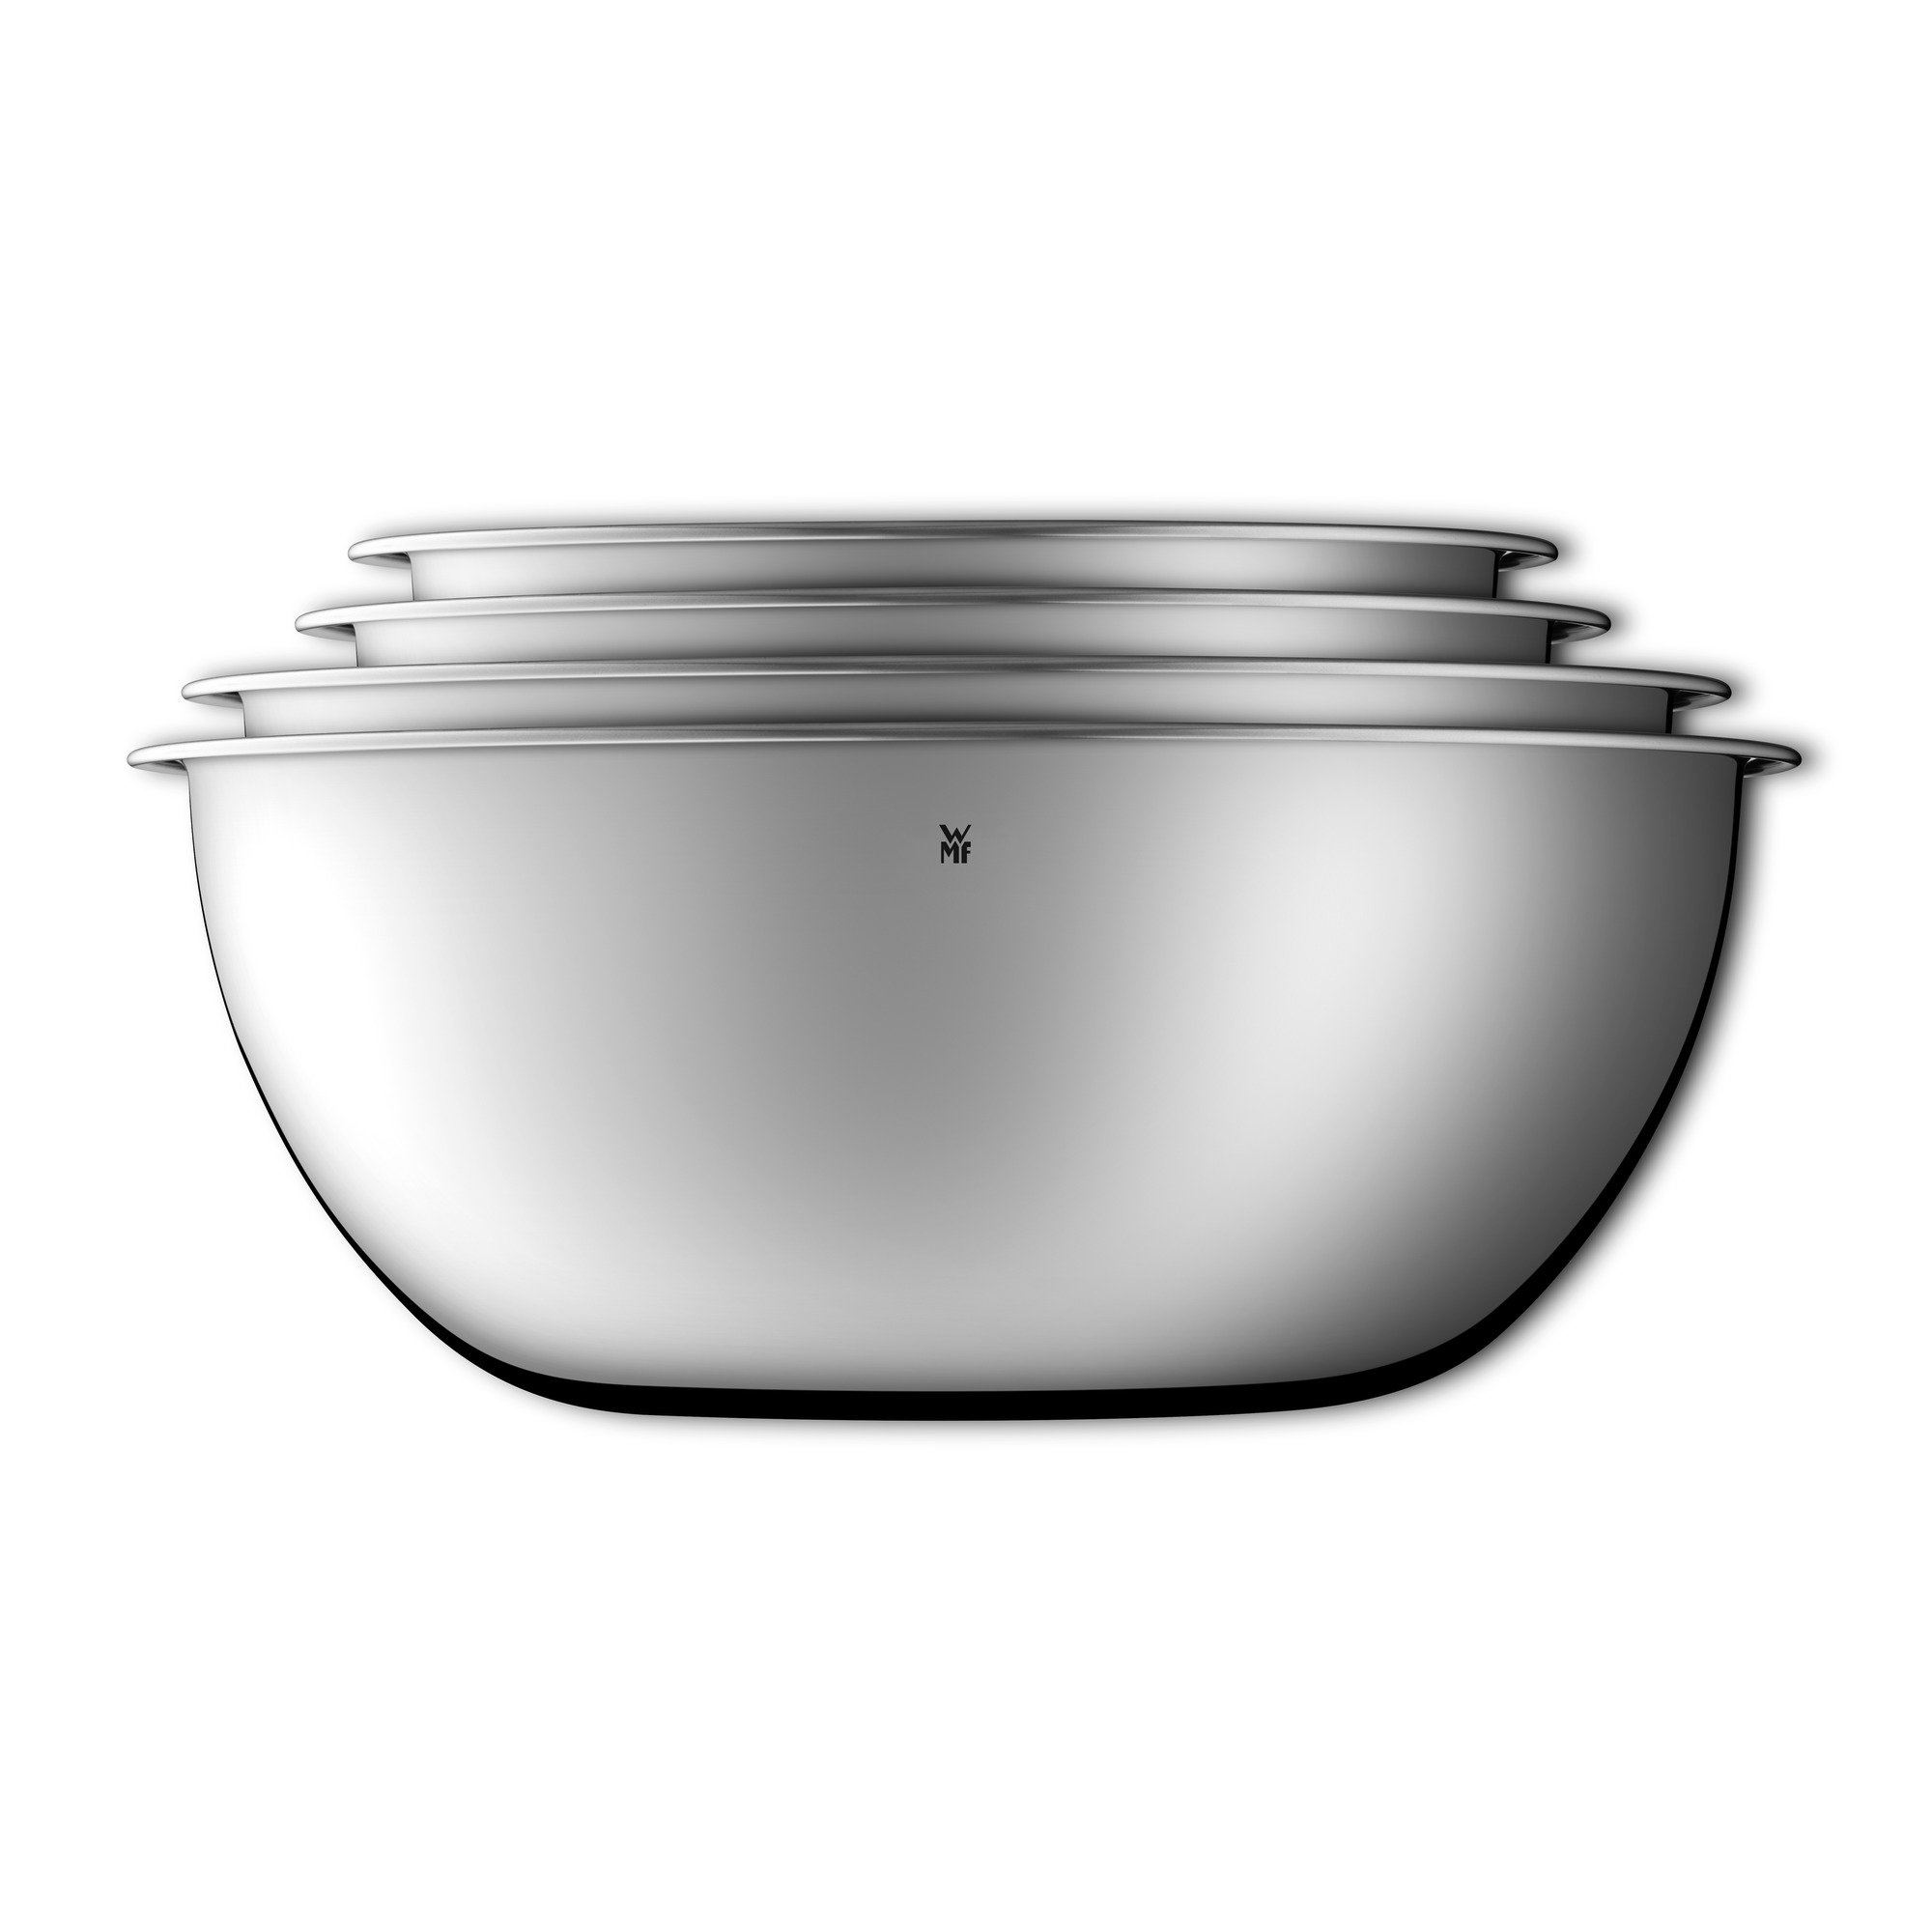 Küchenschüssel-Set Gourmet 4-teilig